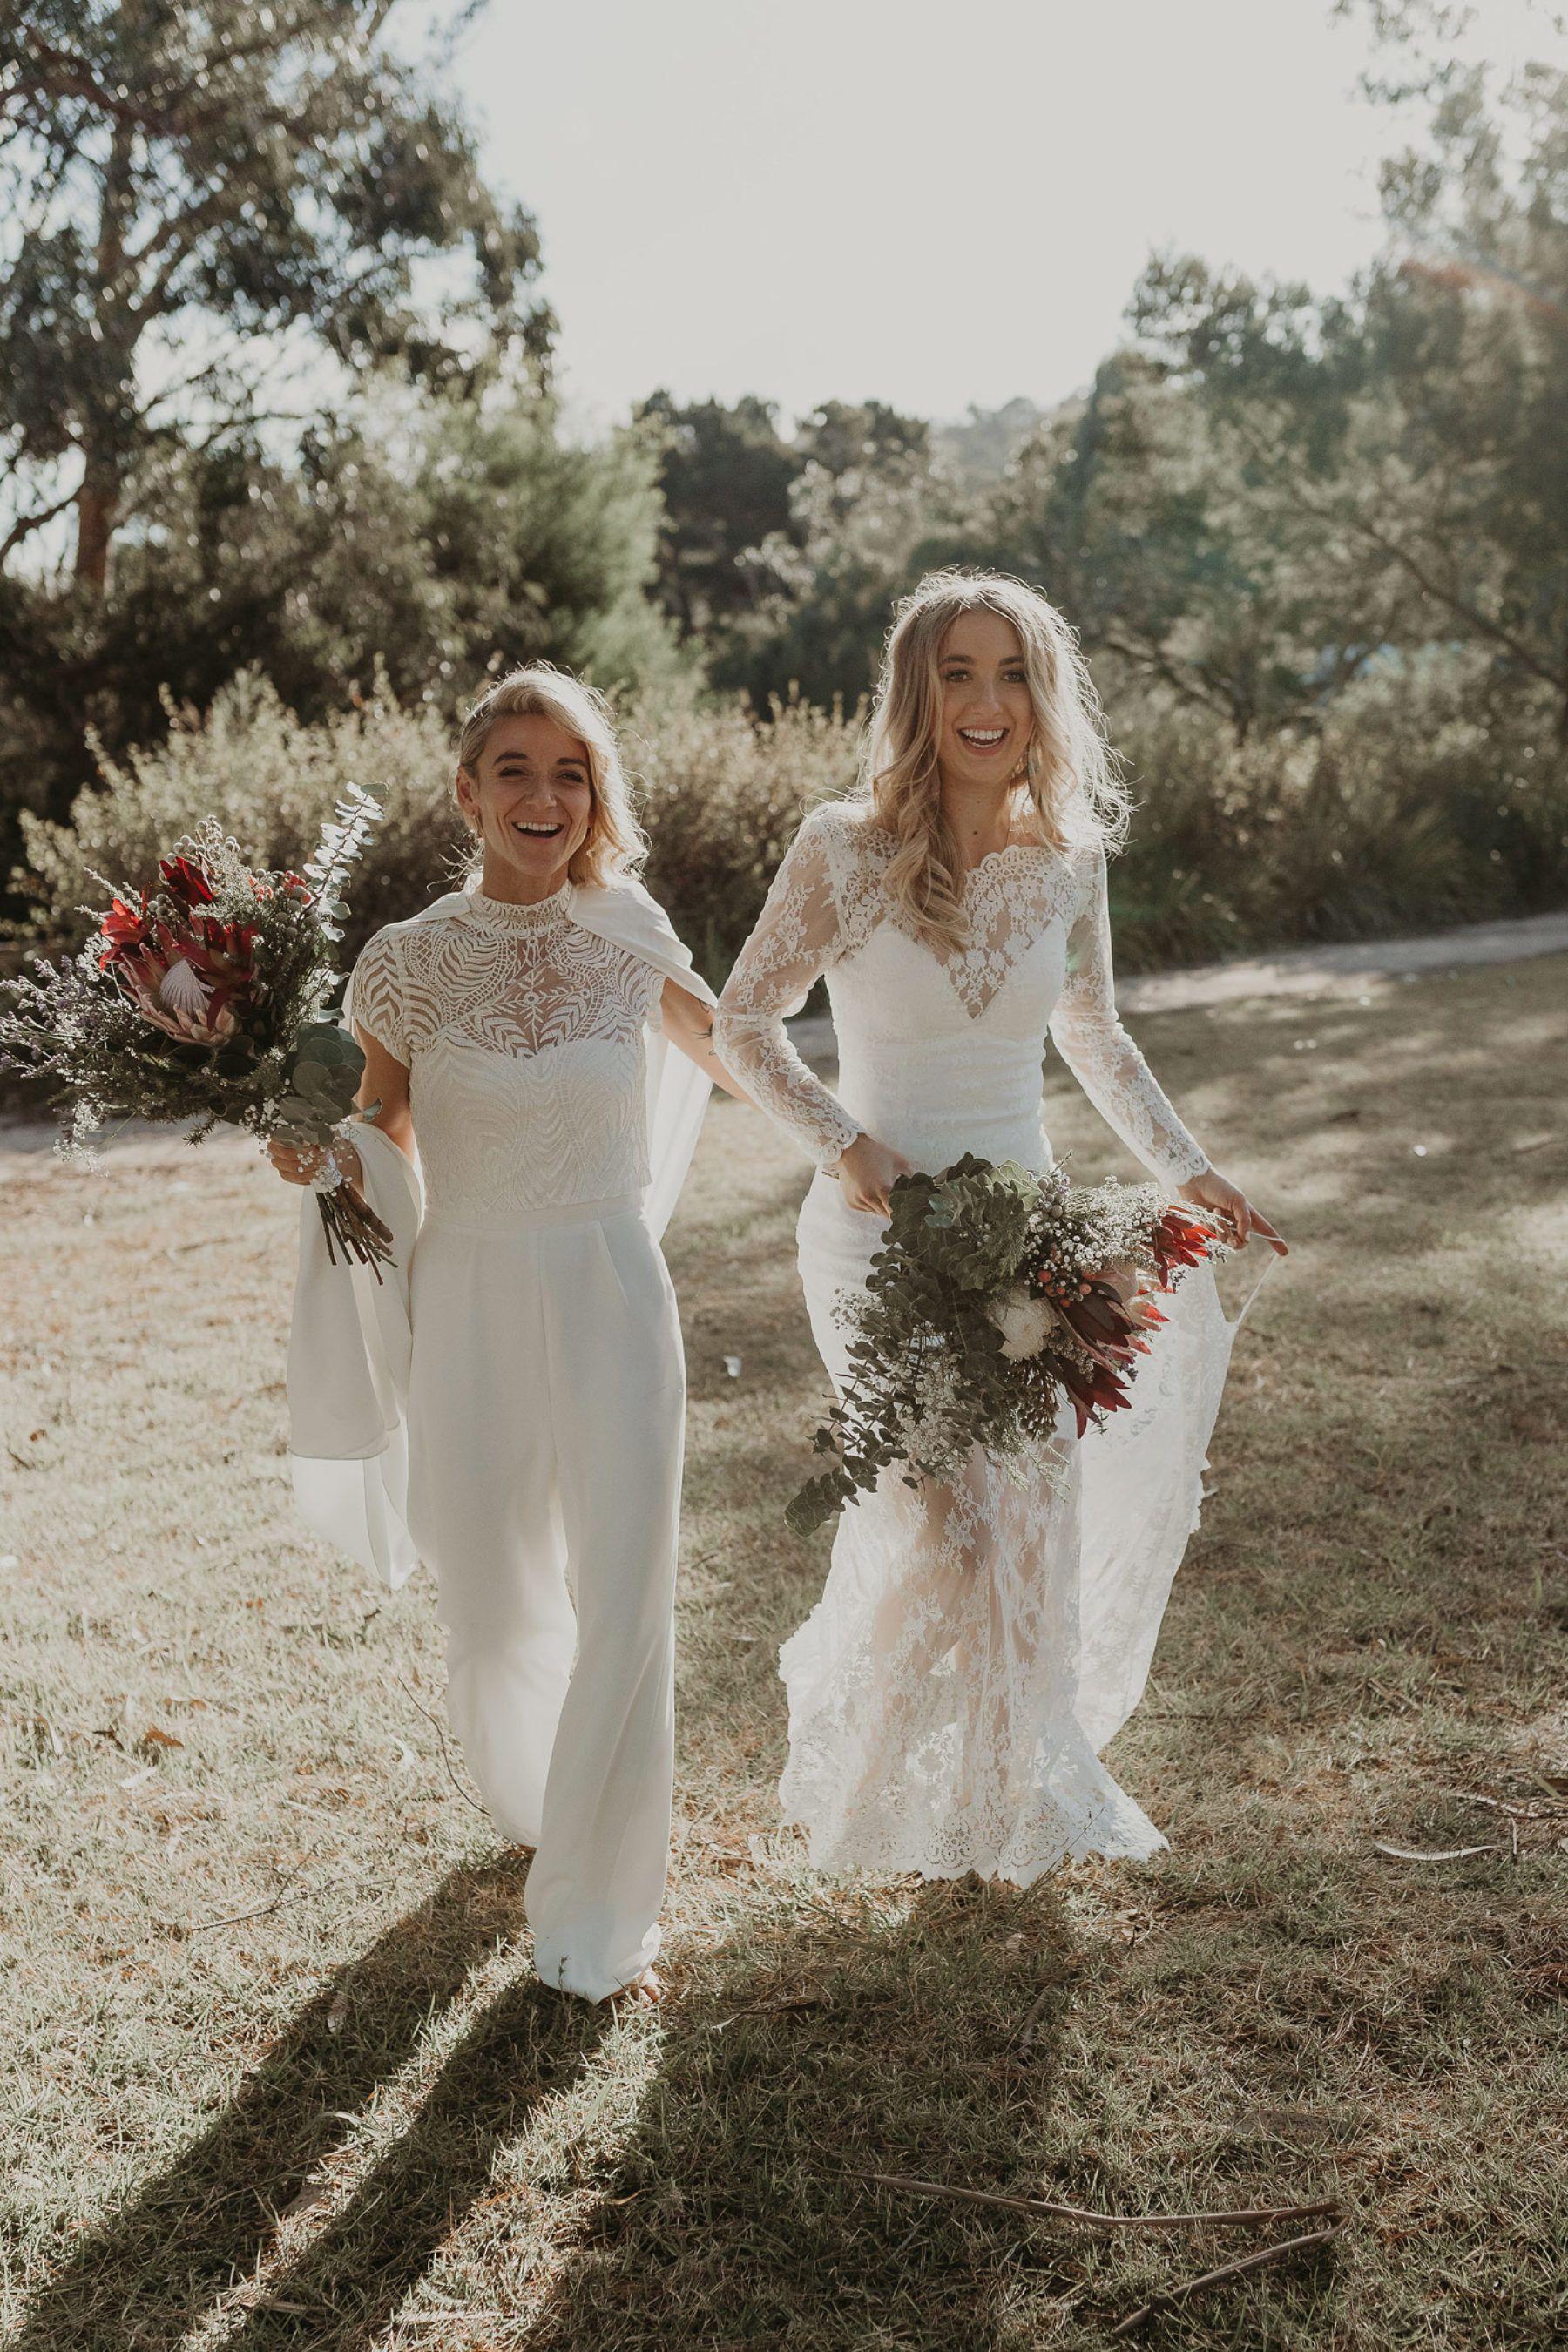 18 Alicia & Kelsey's Wedding 18 ideas   wedding, wedding signs ...